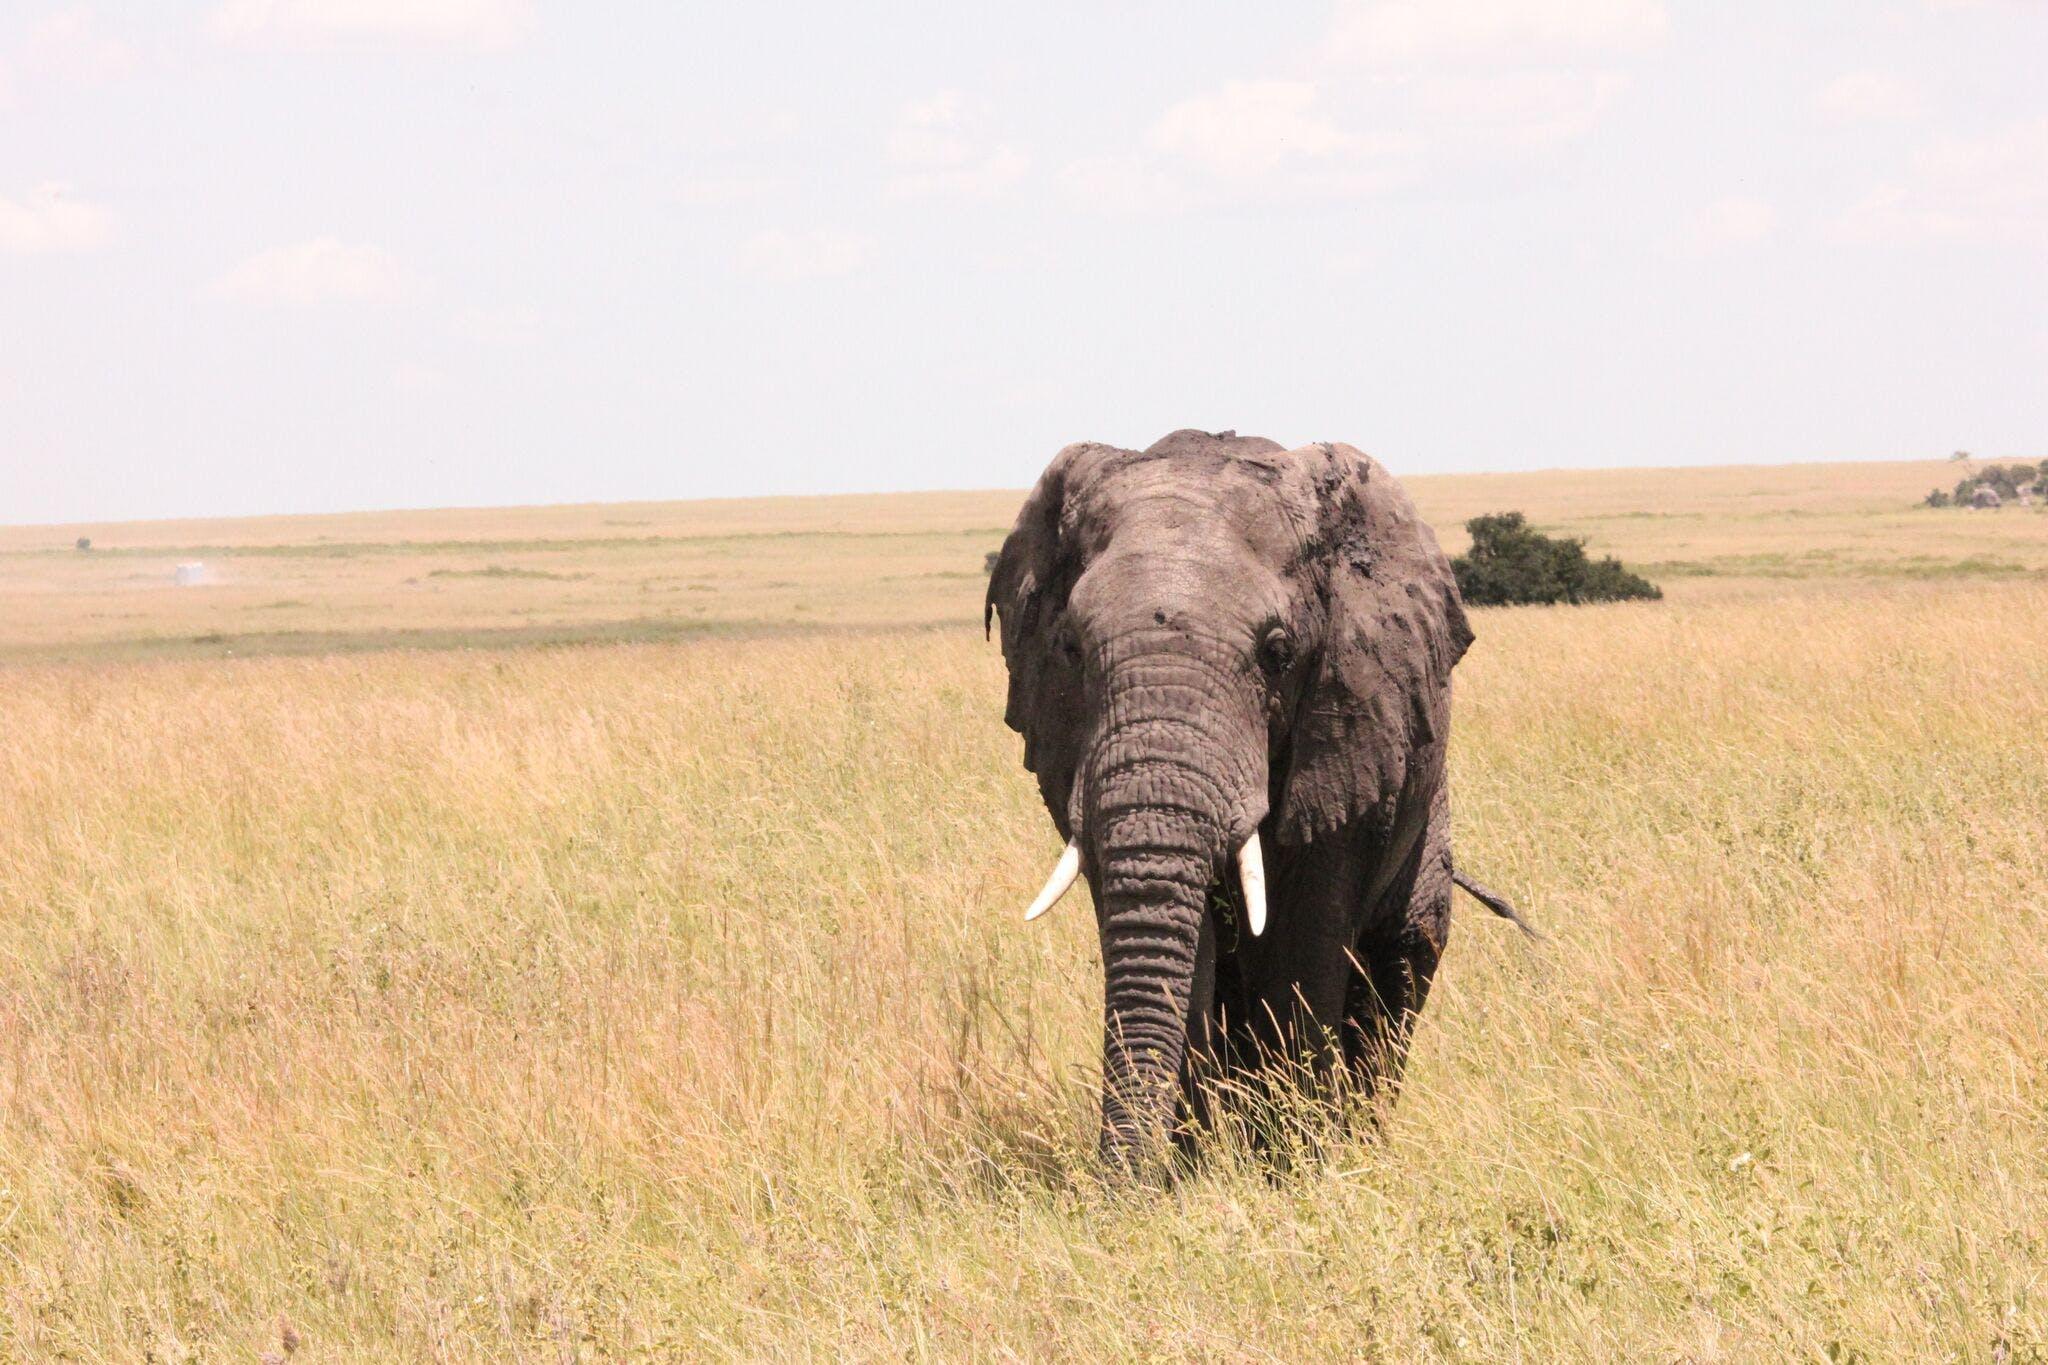 Elephant on Brown Grass Field